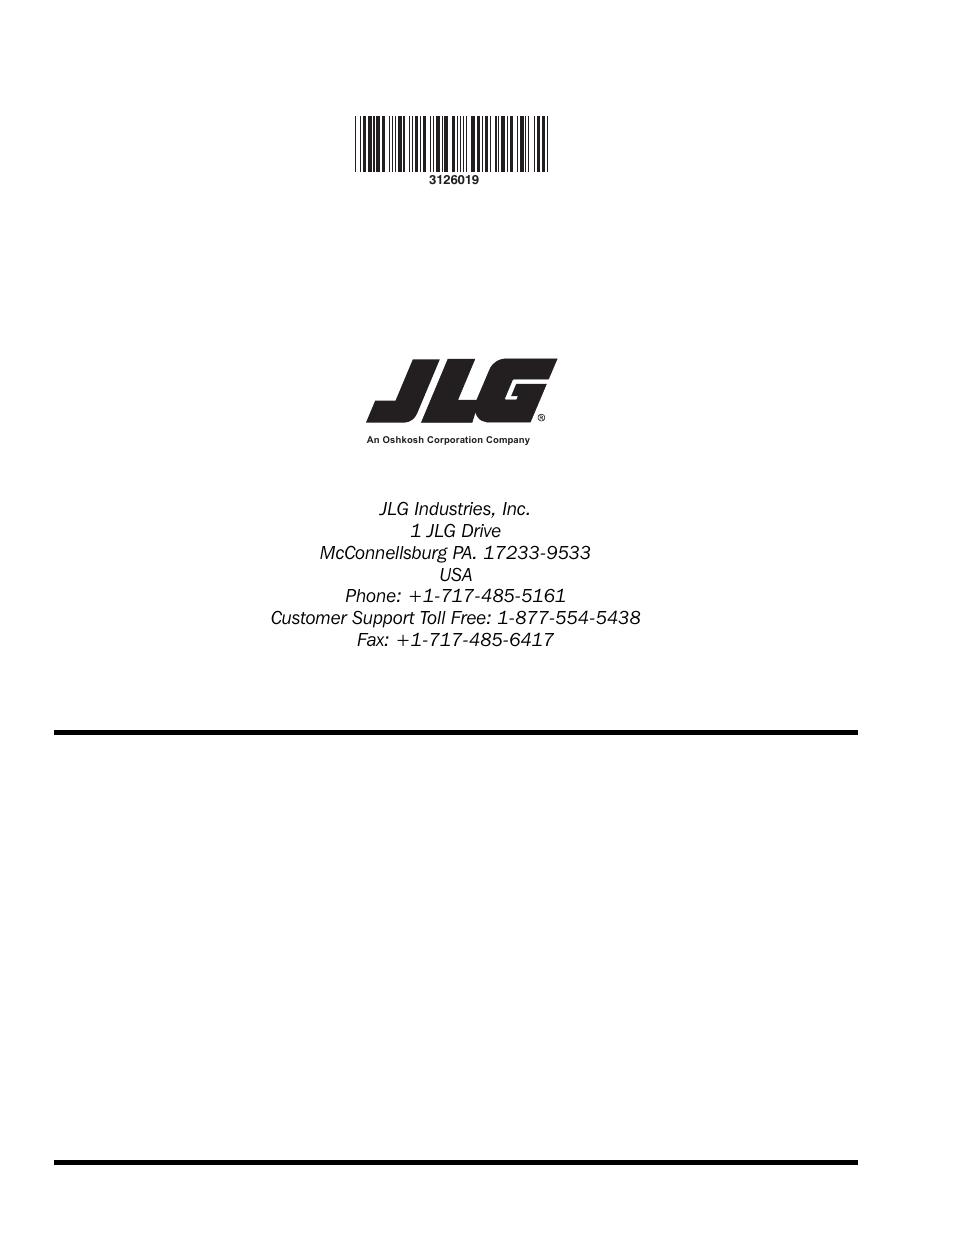 Jlg G12 55A Service Manual User Manual - Berkshireregion